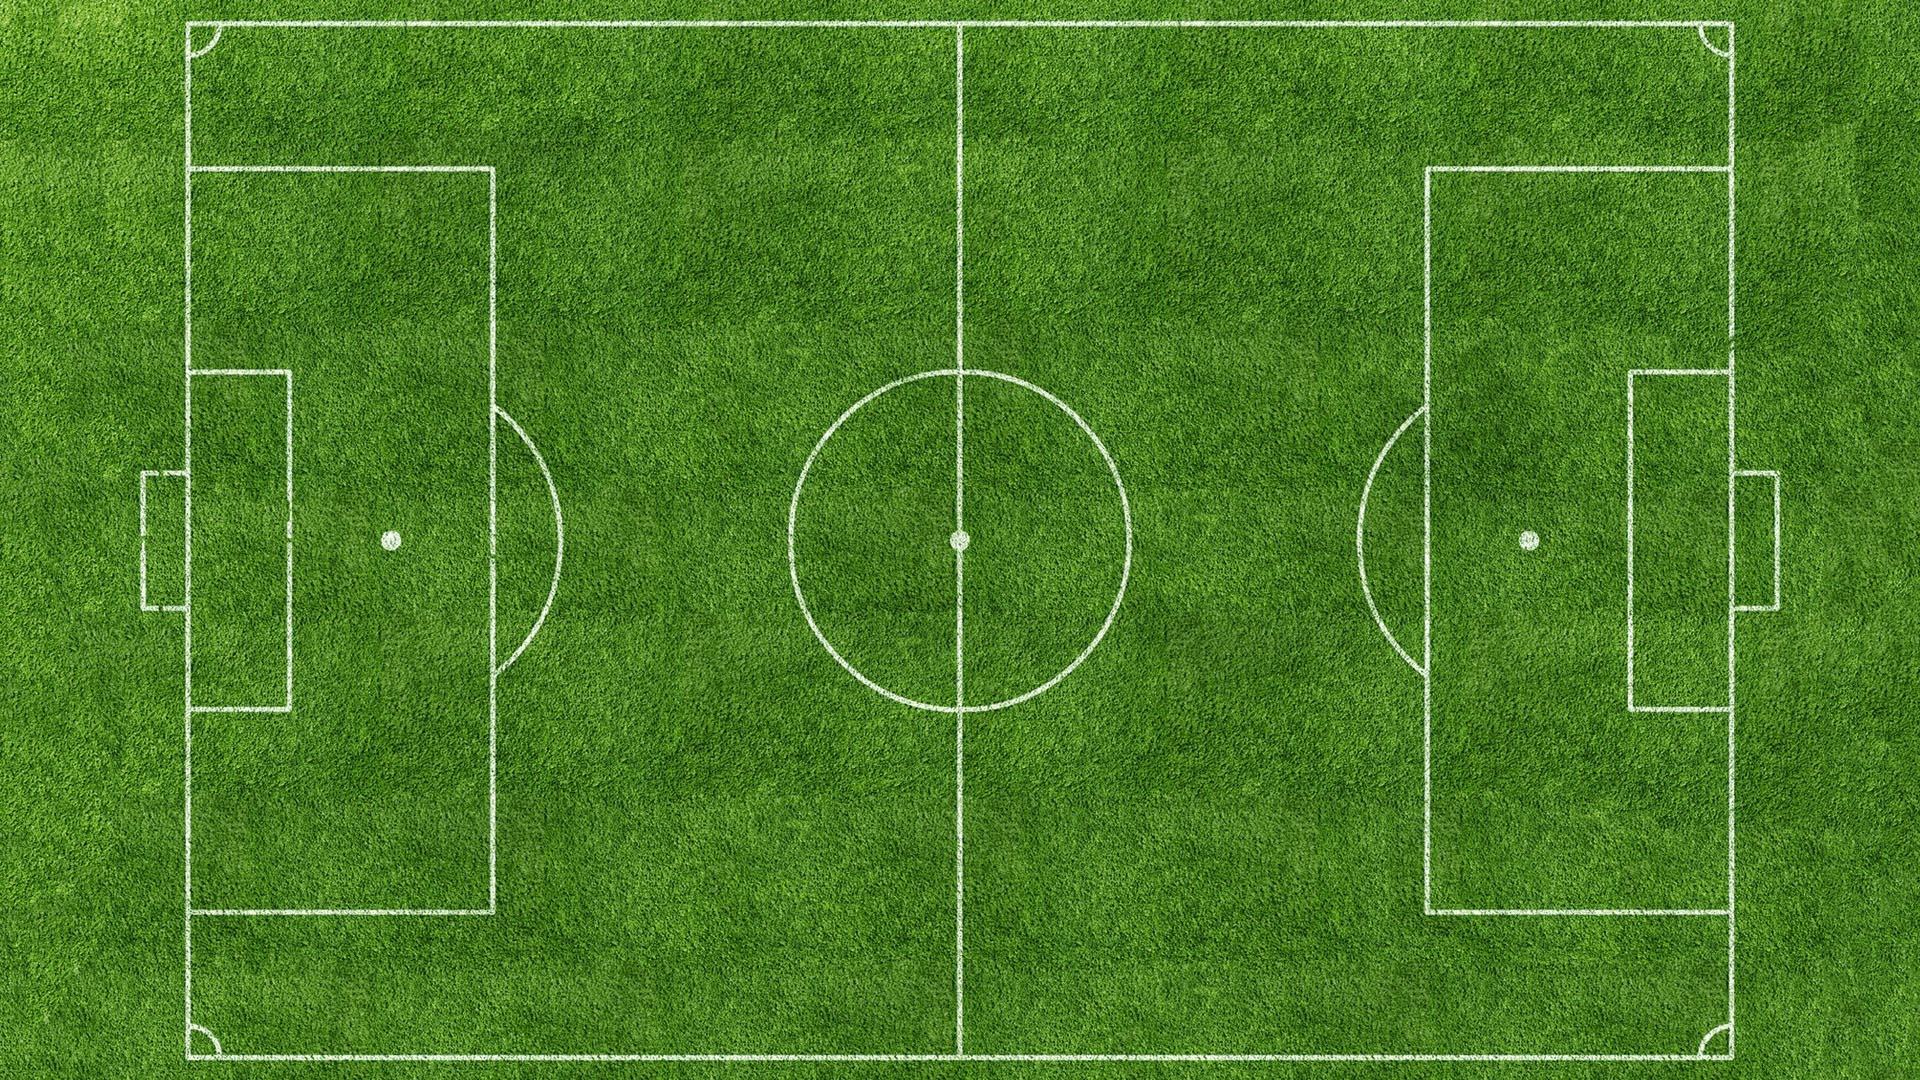 Soccer free photo